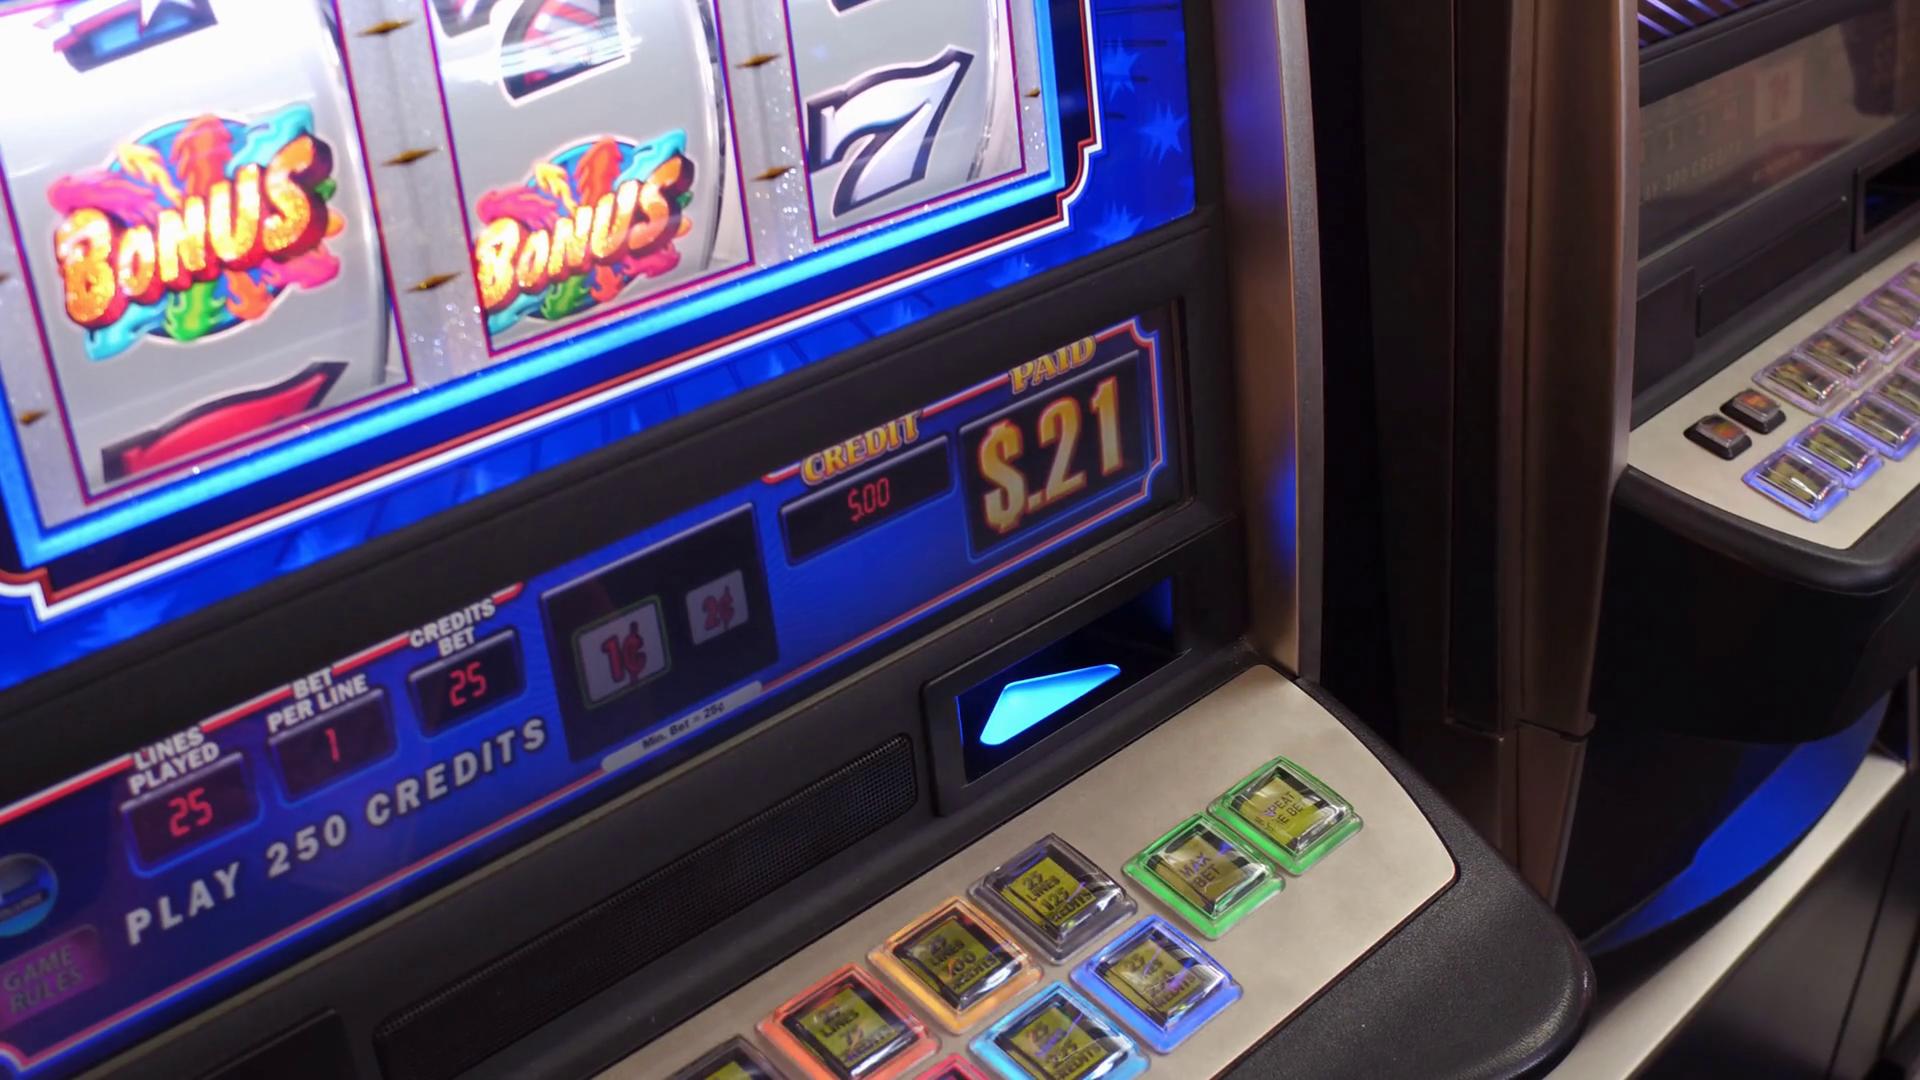 Player inserting money into casino gambling slot machine 4k Stock Video  Footage - Storyblocks